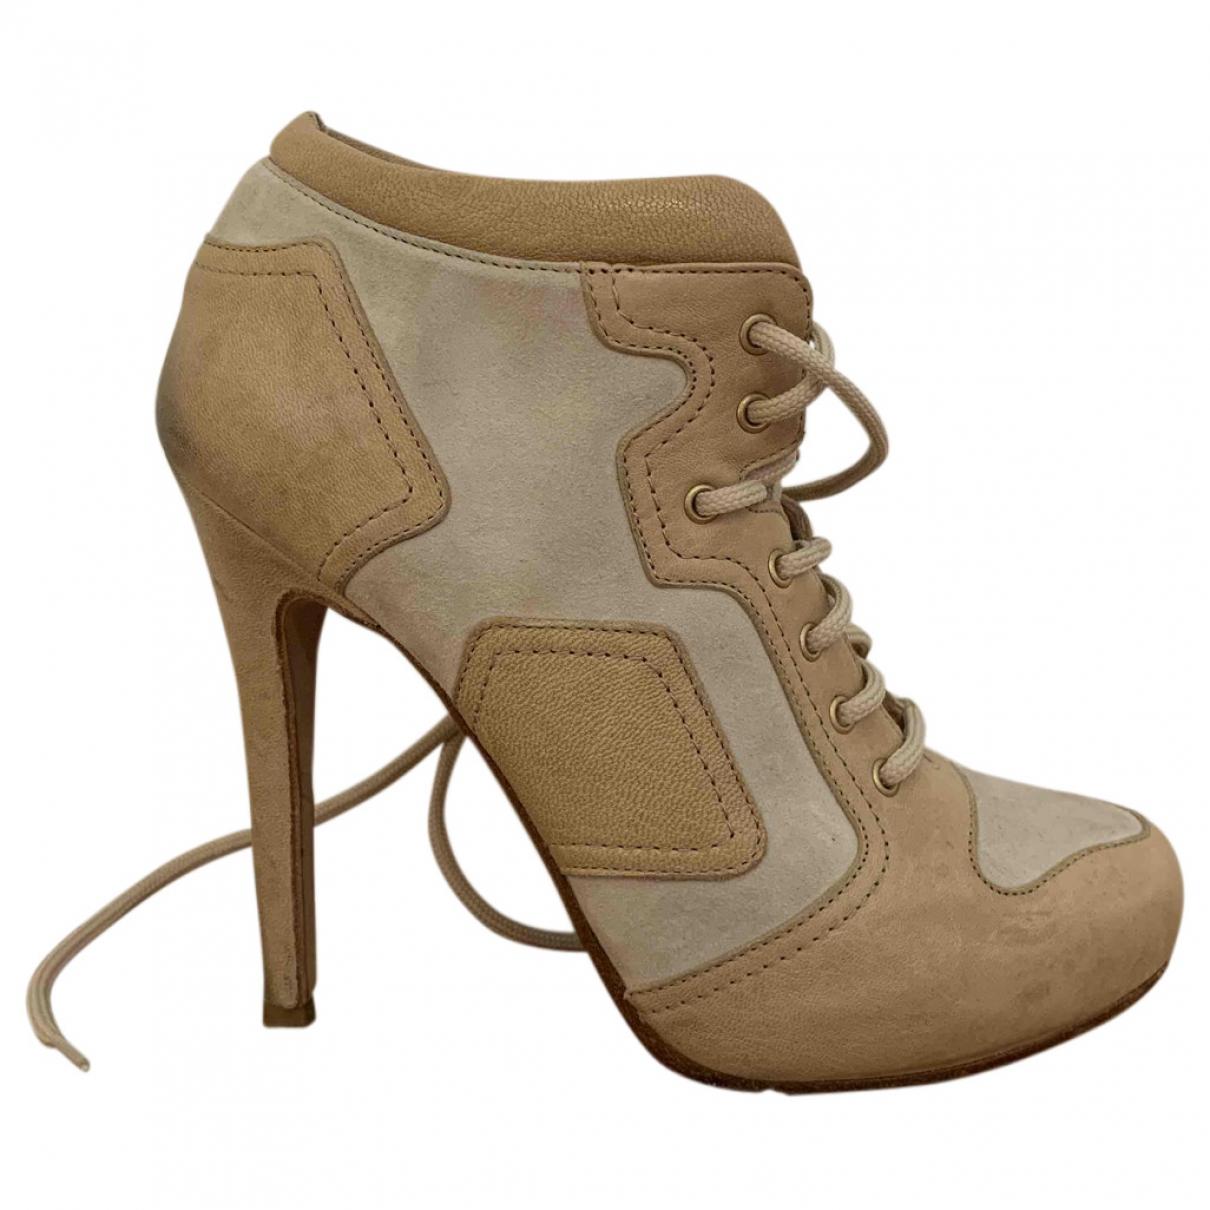 Alexander Mcqueen \N Beige Leather Ankle boots for Women 37 IT